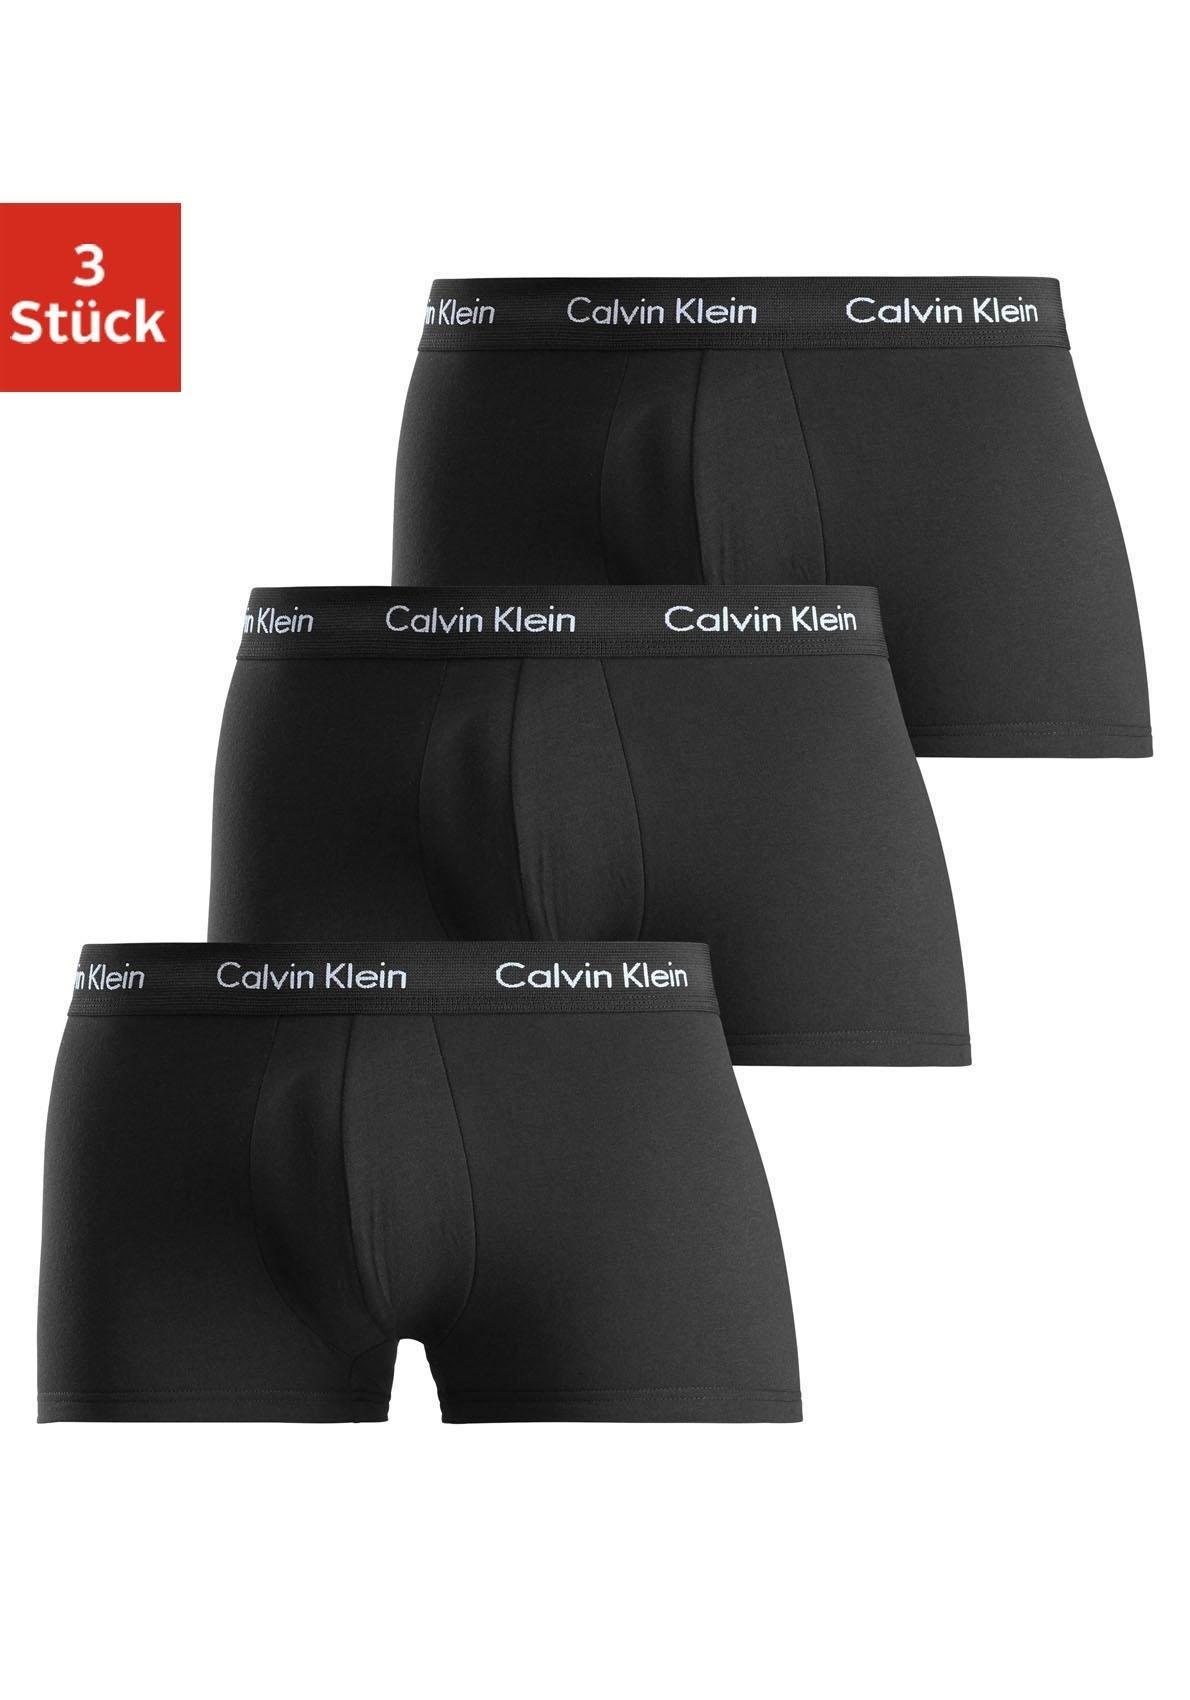 Calvin Klein Hipster (3 stuks) veilig op lascana.nl kopen